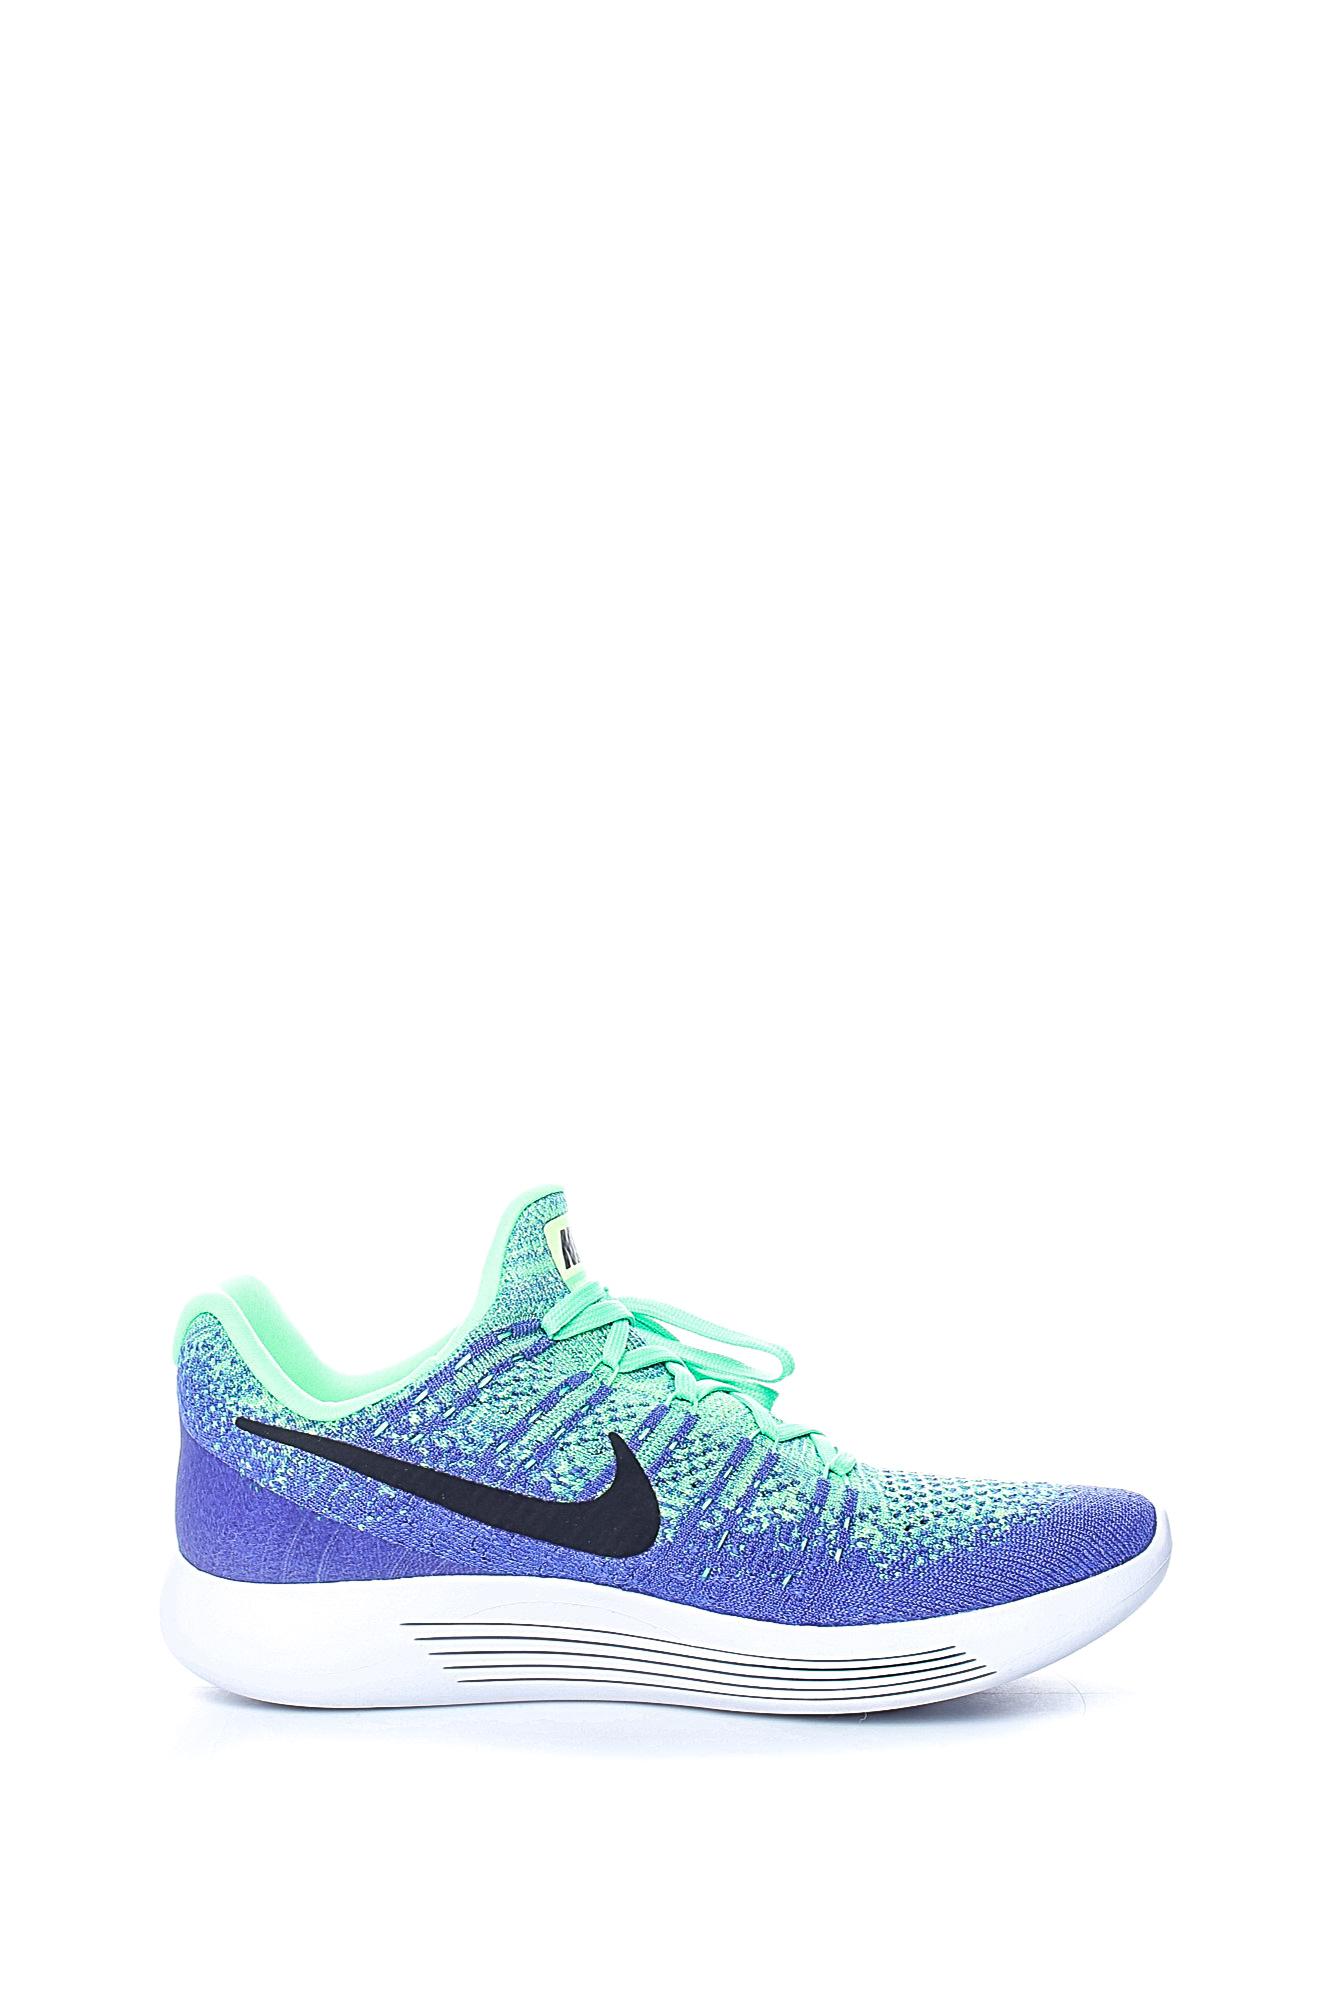 NIKE – Ανδρικά αθλητικά παπούτσια Nike LUNAREPIC LOW FLYKNIT 2 πράσινα – μπλε